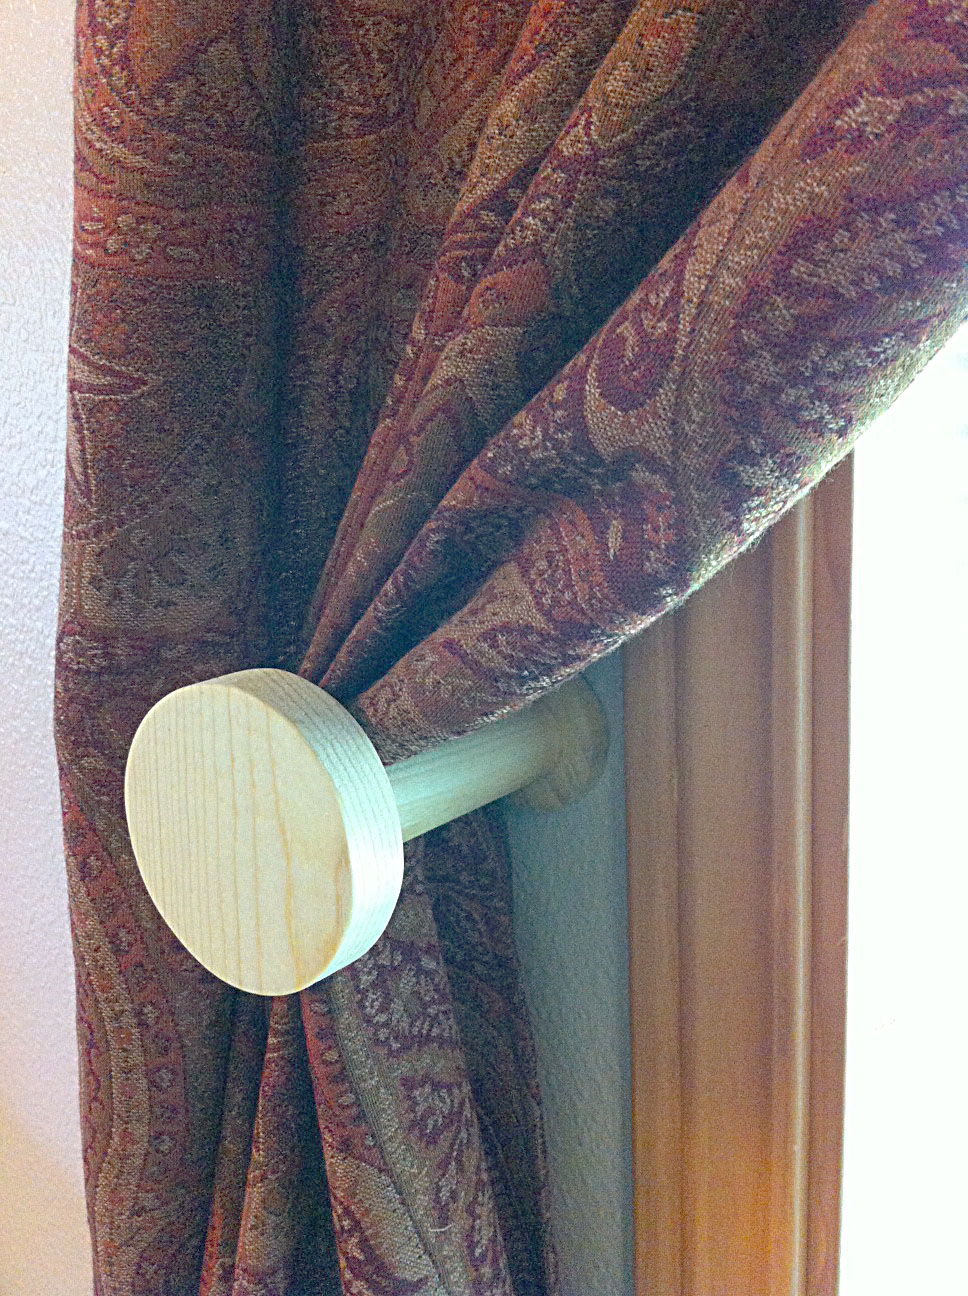 Circle Sports Ball Shape Curtain Holdback Tieback With Detachable Wood Face Plate